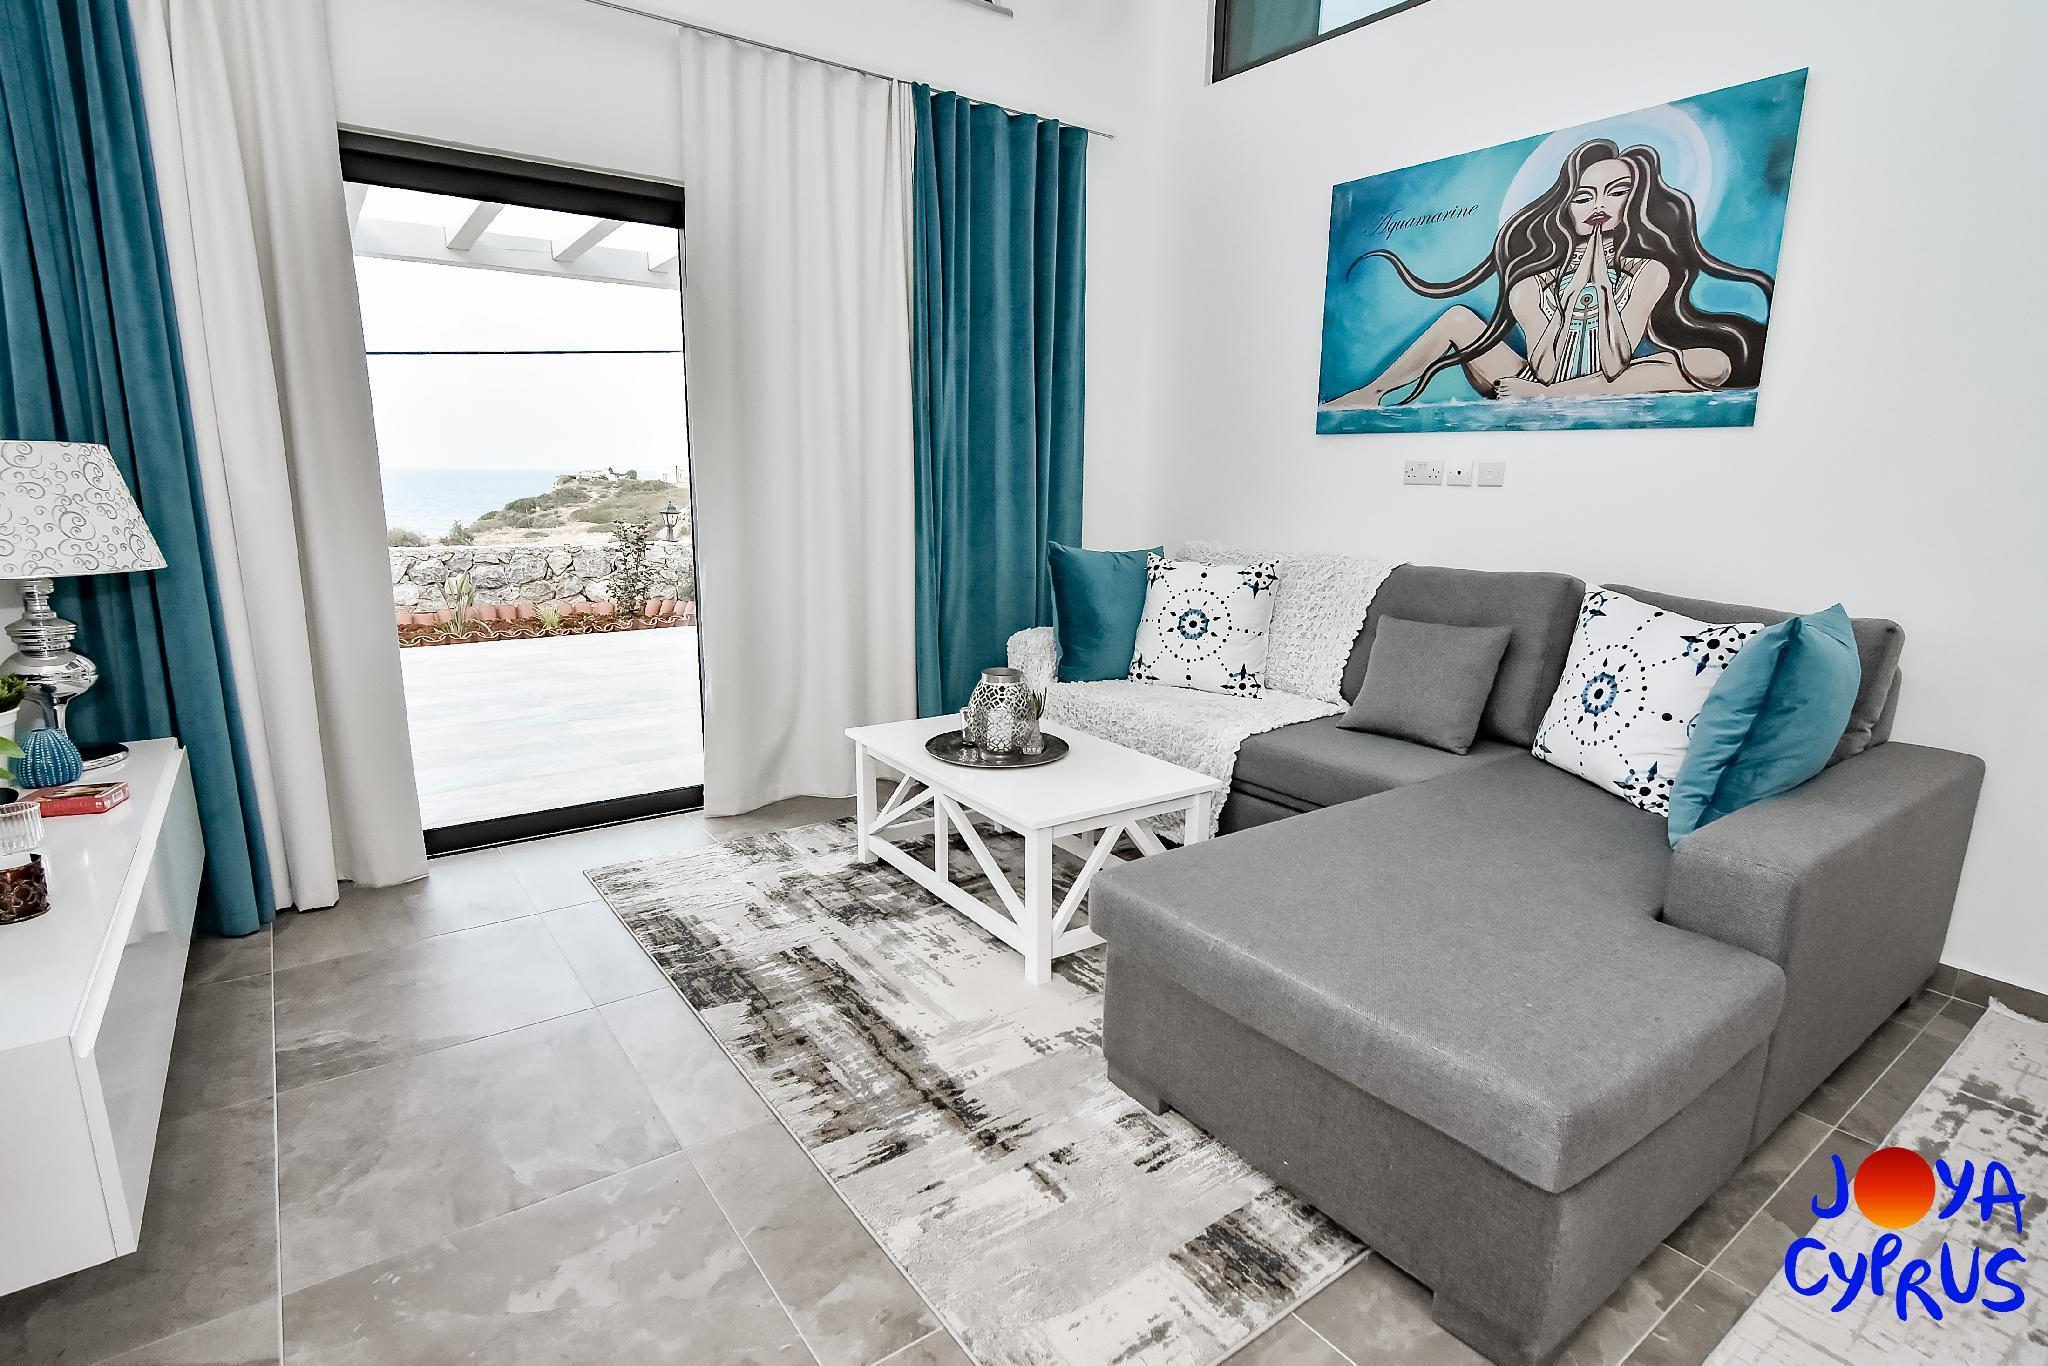 Joya Cyprus Seabreeze Garden Apartment